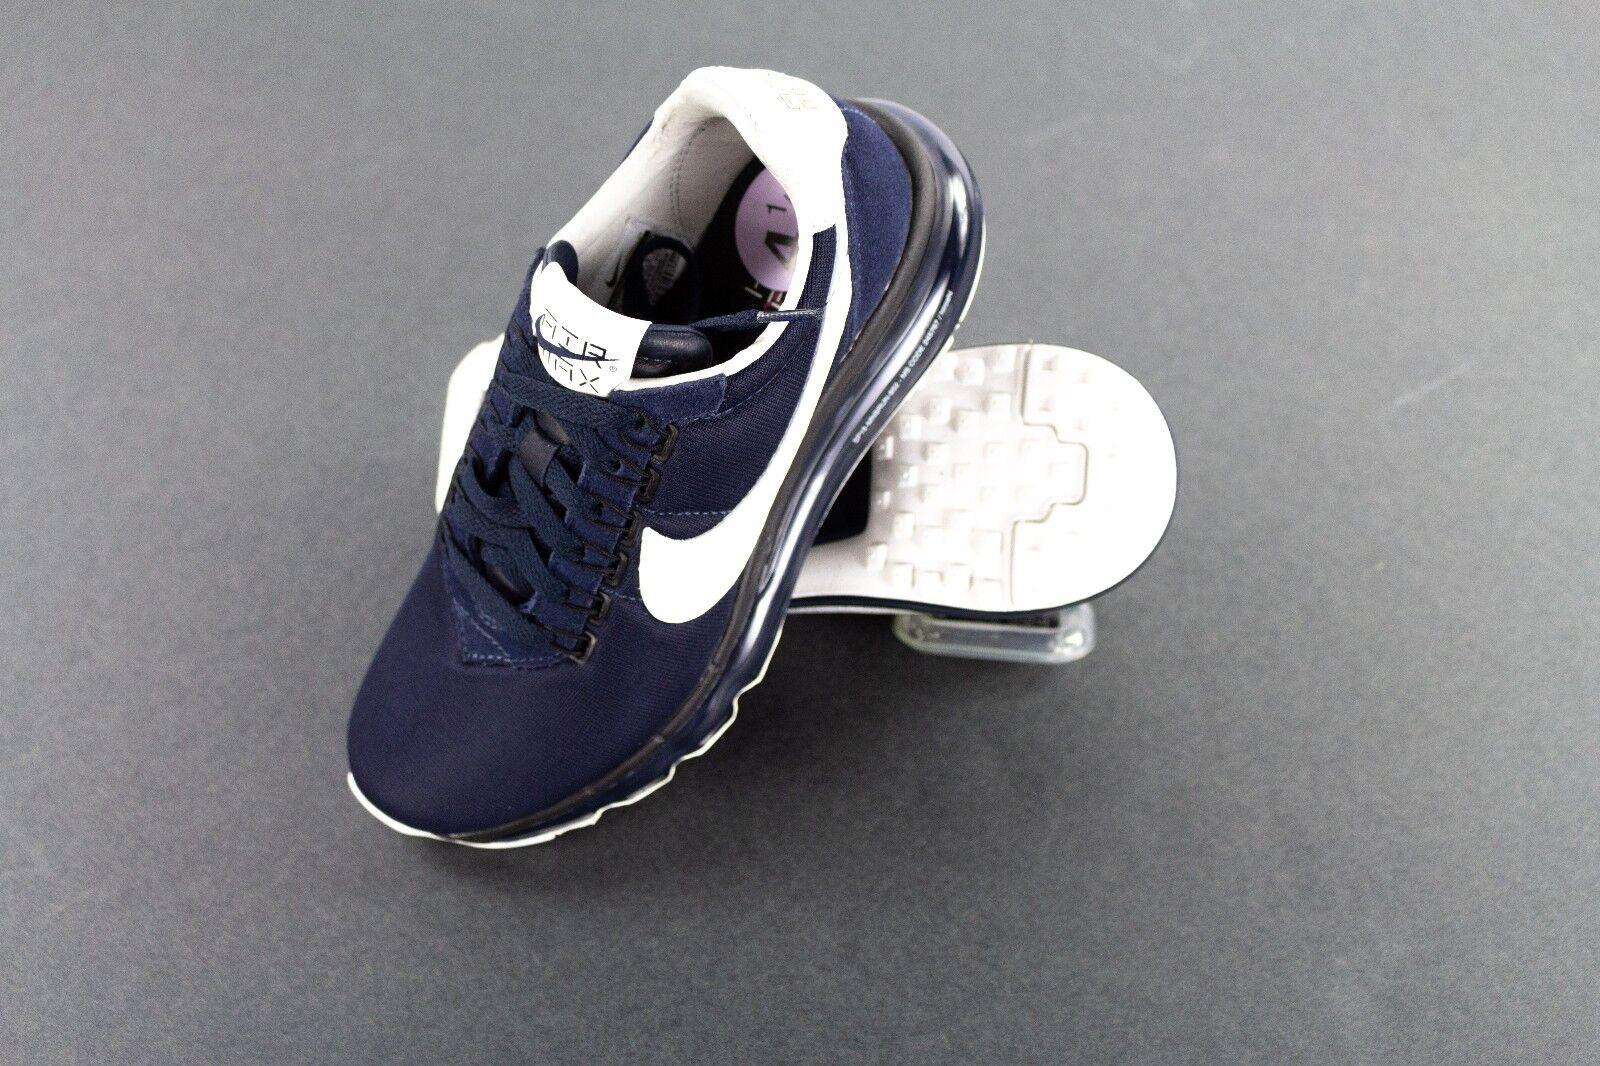 Nike Air Max LD-Zero Hiroshi Fujiwara HTM Comfortable The most popular shoes for men and women